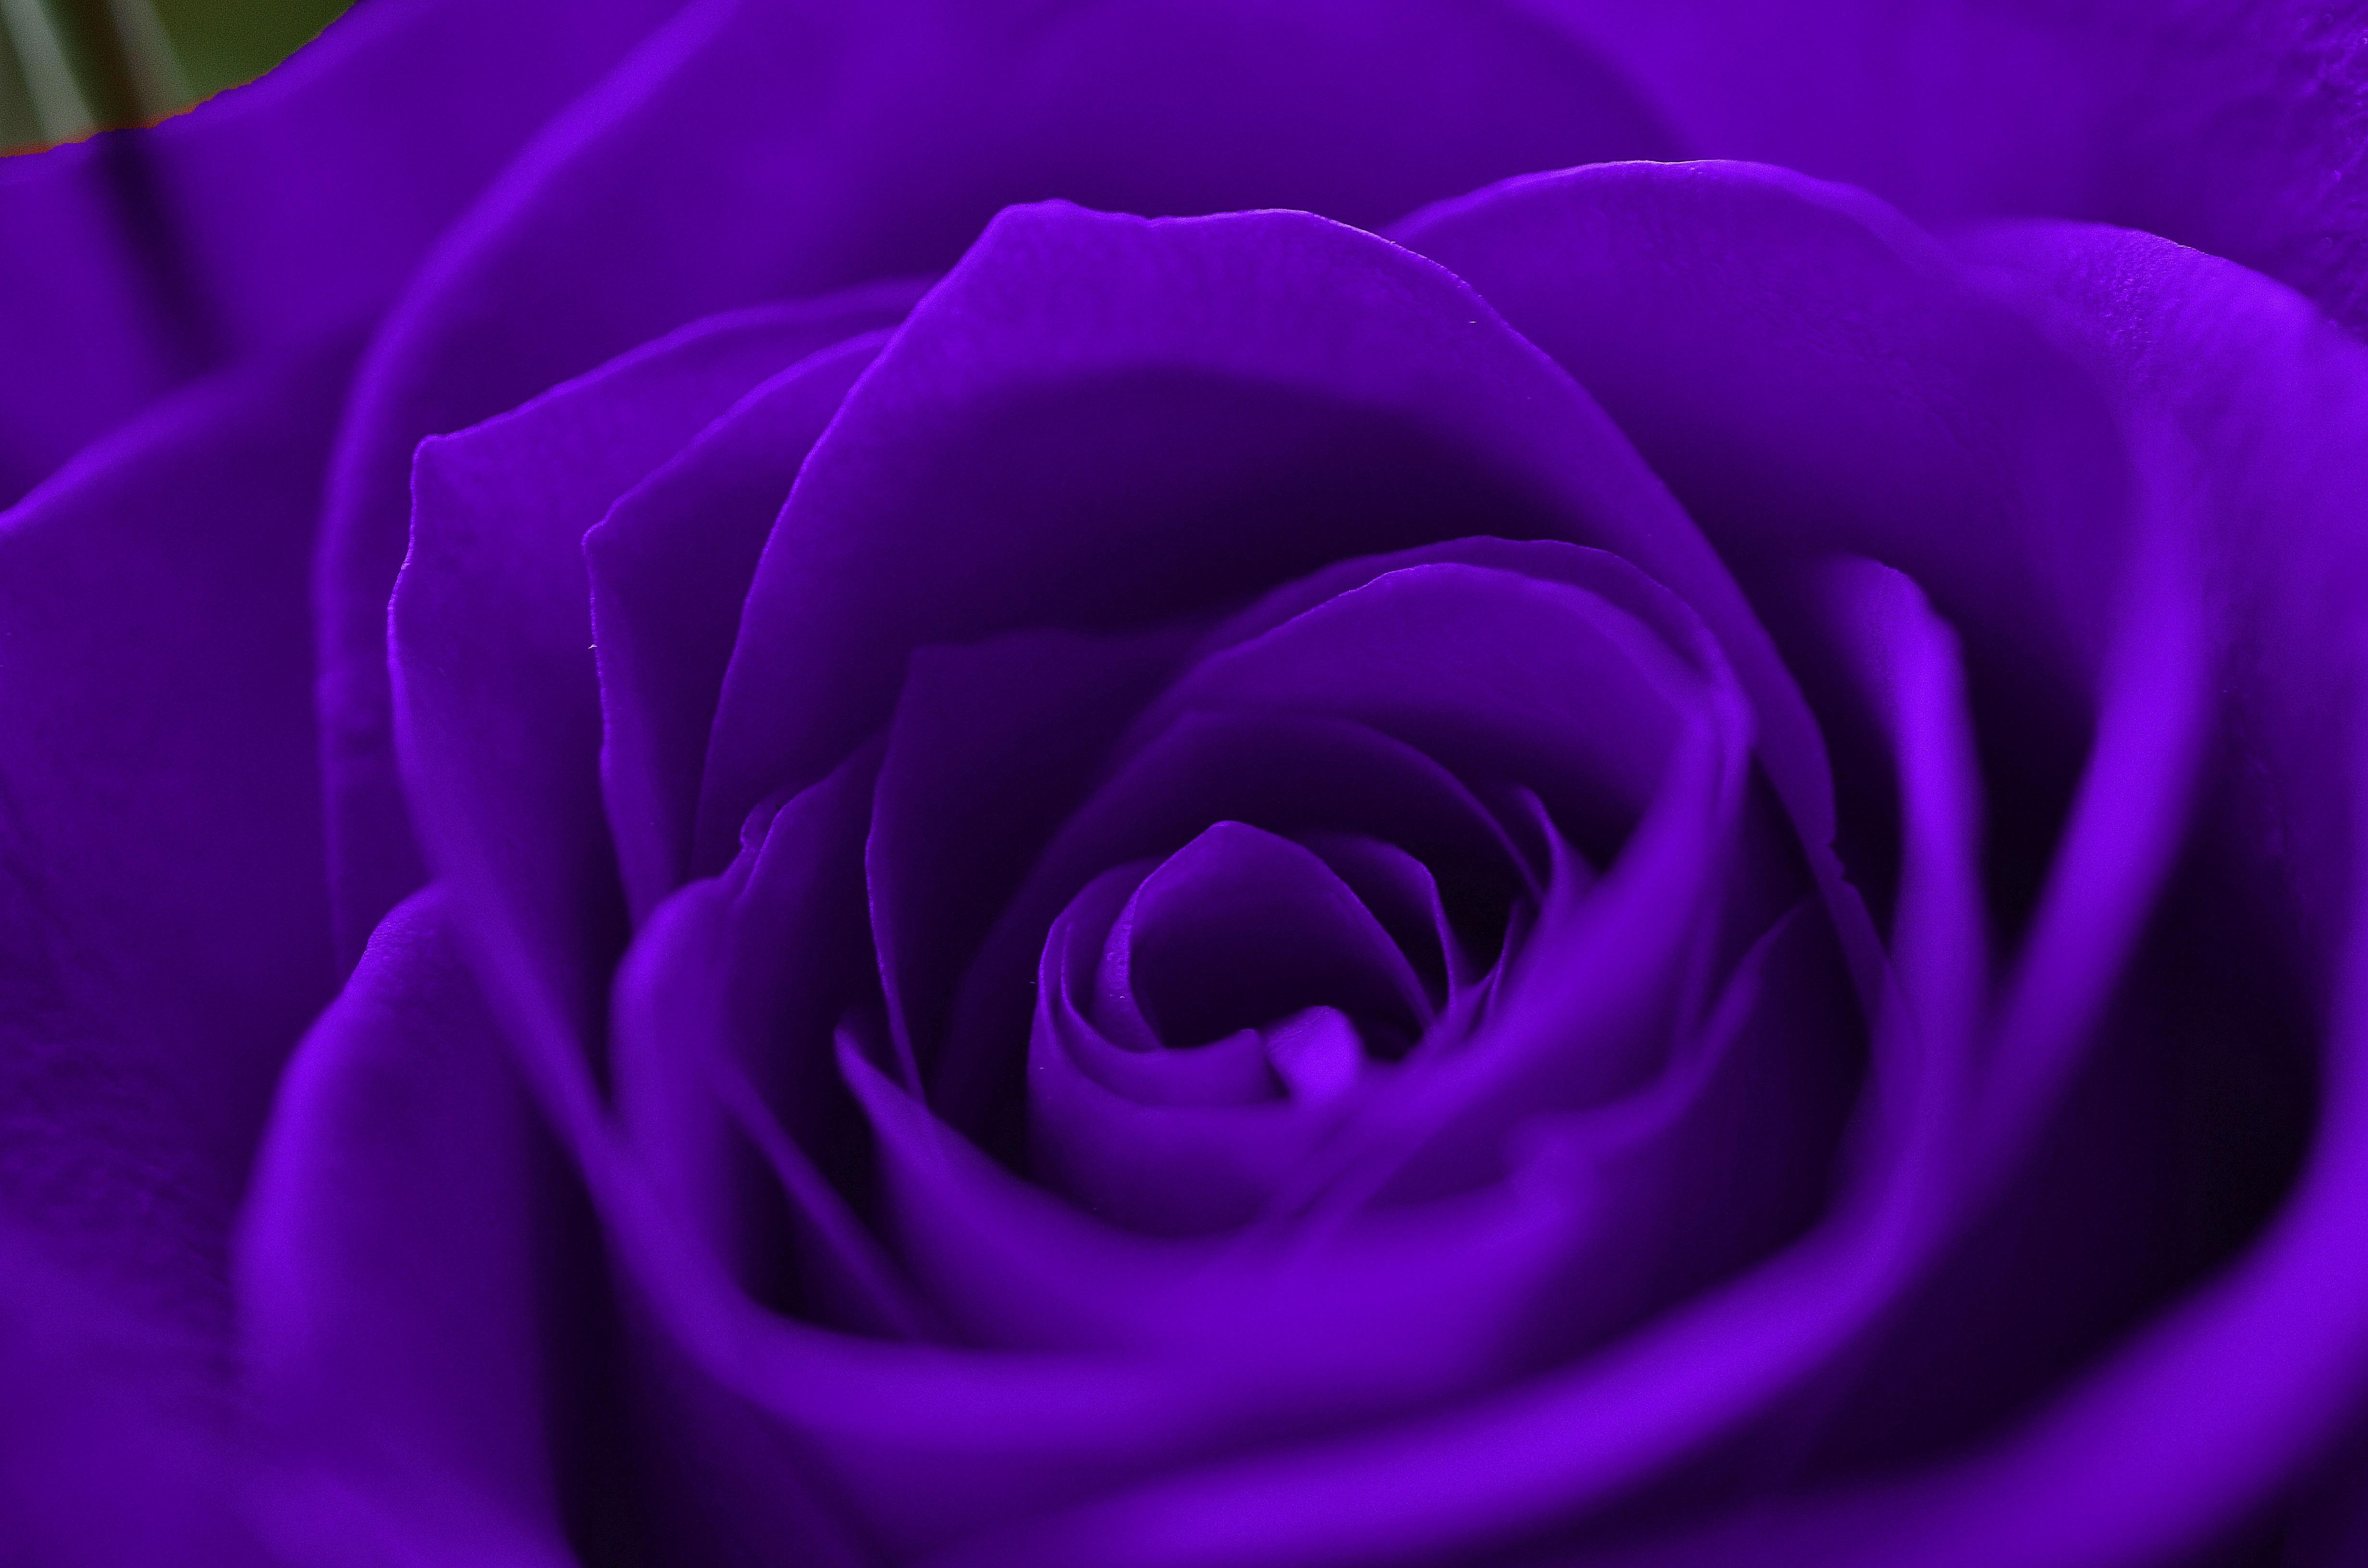 Plant Flower Purple Petal Love Rose Red Color Macro Romance Romantic Pink  Wedding Roses Violet Valentine